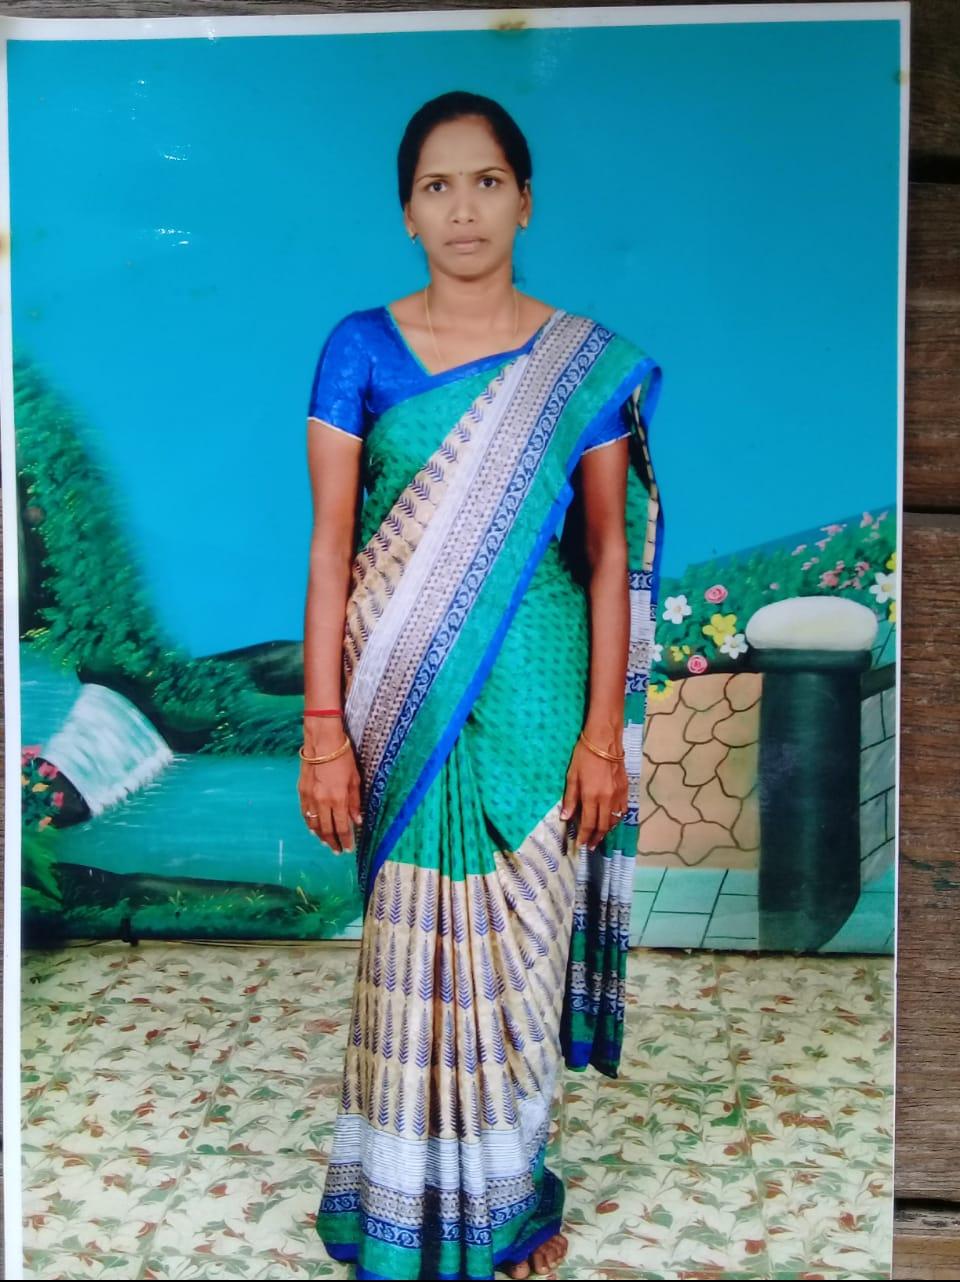 Indian-Ex-Singapore Maid-POOSAIKUMAR VADIVUKARASI